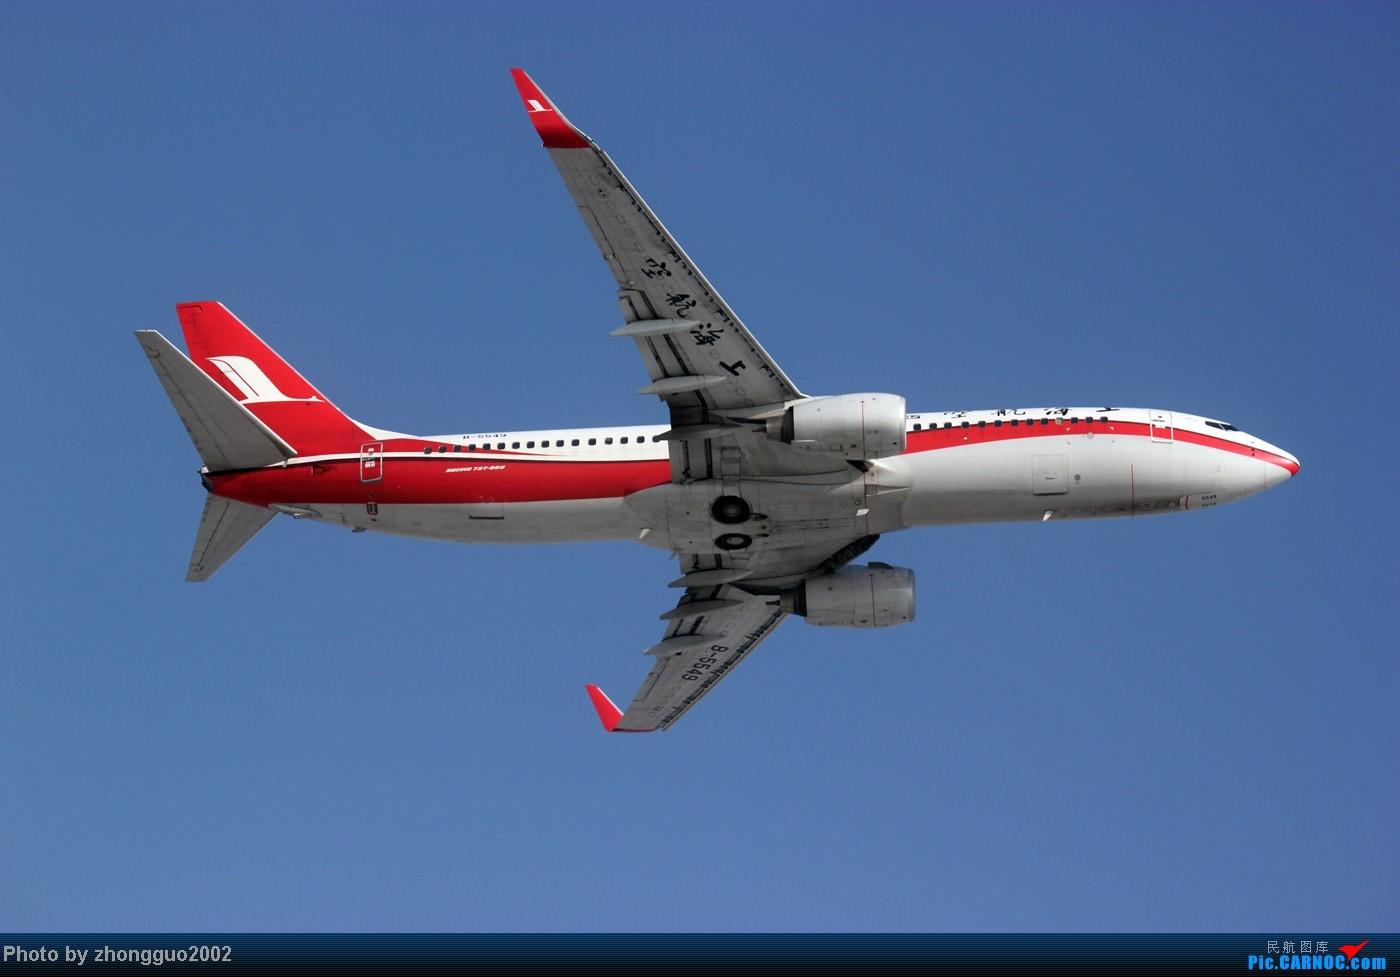 Re:[原创]随着2012年的最后一场雪的到了,我的2012年拍机工作也圆满的结束了,把这段时间里灰机整理一下,把没发的,我个人认为好的发上来! BOEING 737-800 B-5549 中国呼和浩特白塔国际机场